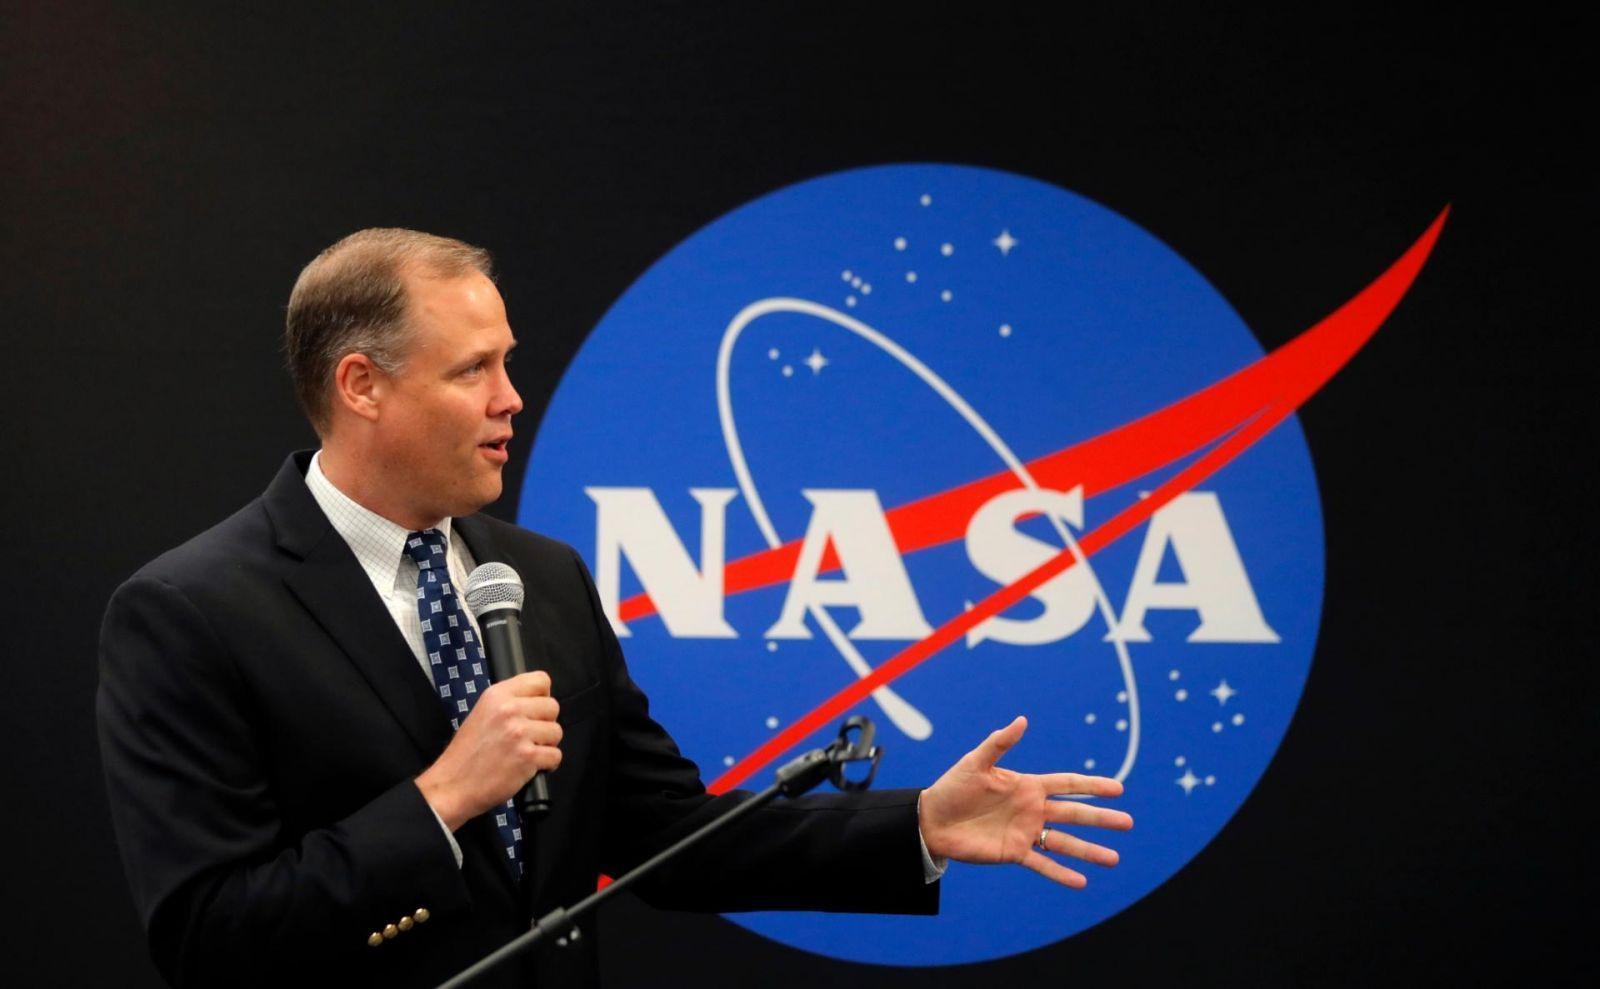 Директор NASA назвал Плутон планетой (755395524591021)